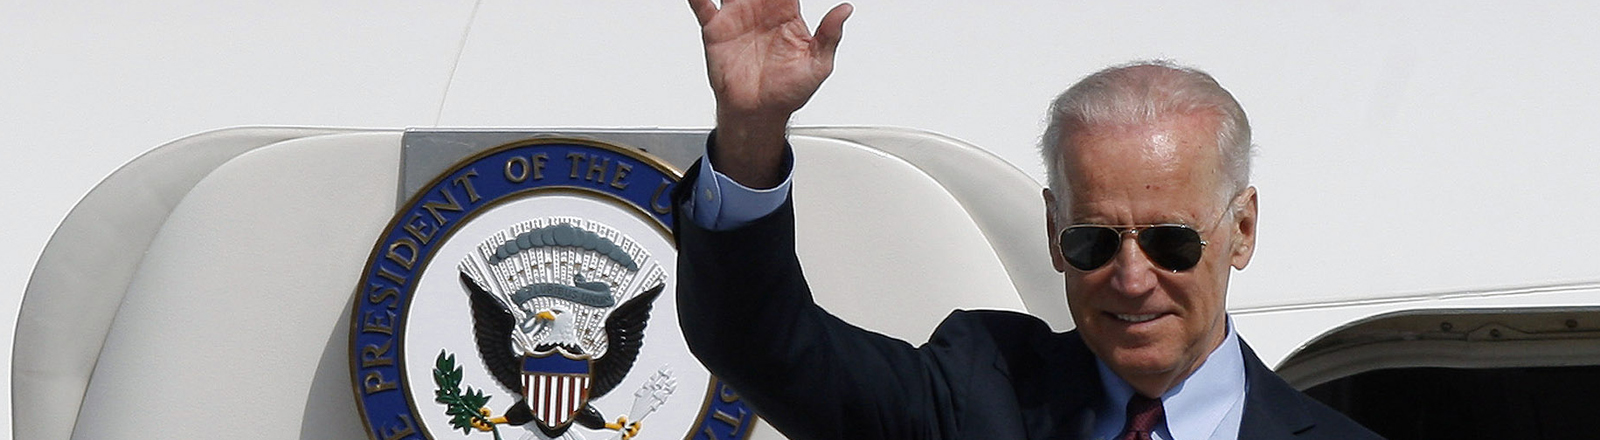 US-Vizepräsident Joe Biden am Flughafen Boryspil in Kiew